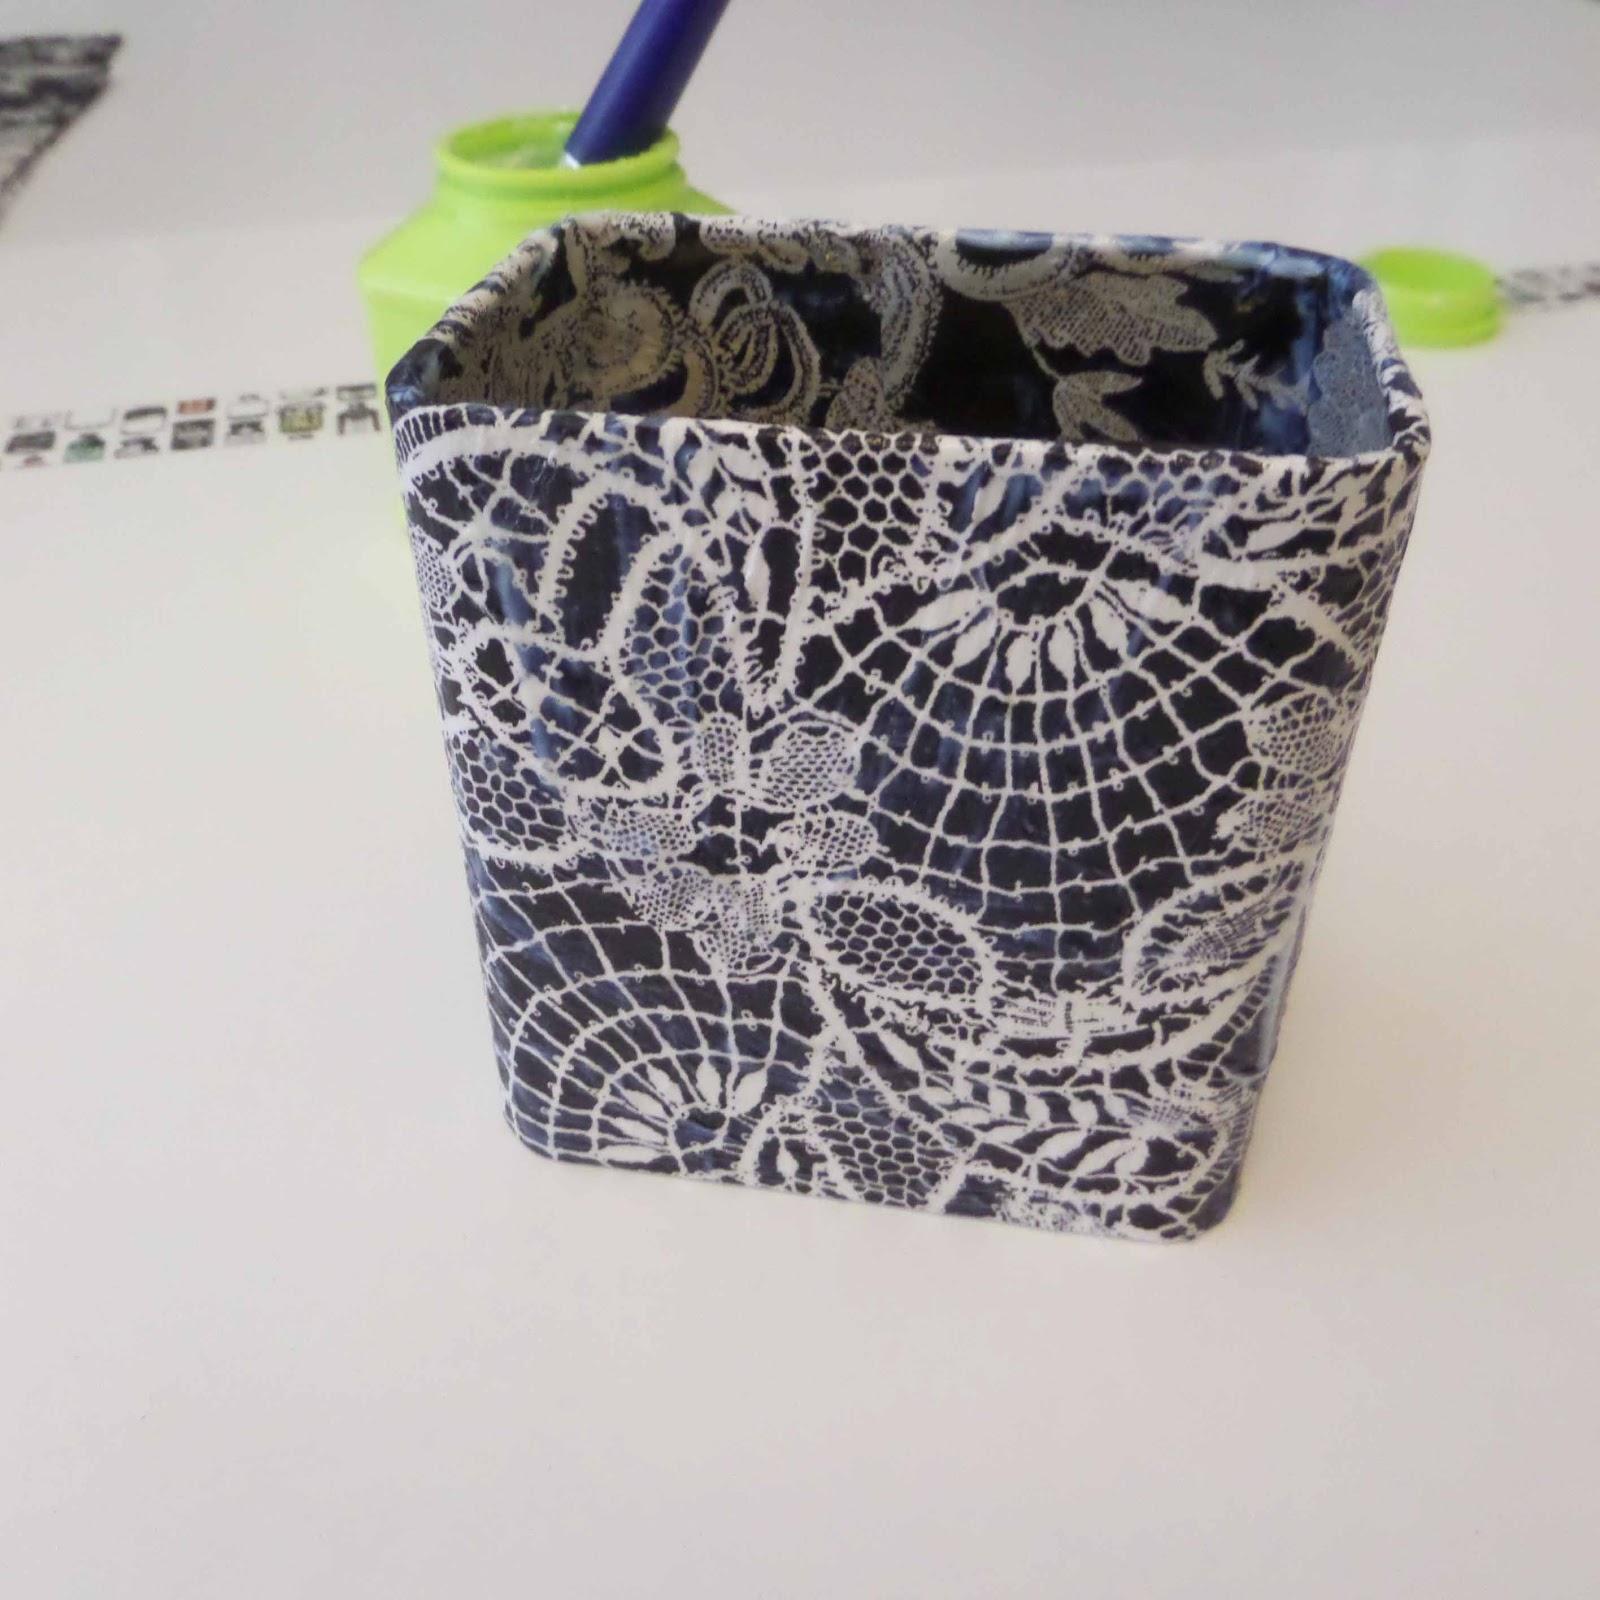 Caja imantada para bol grafos leroy merlin for Iman adhesivo leroy merlin